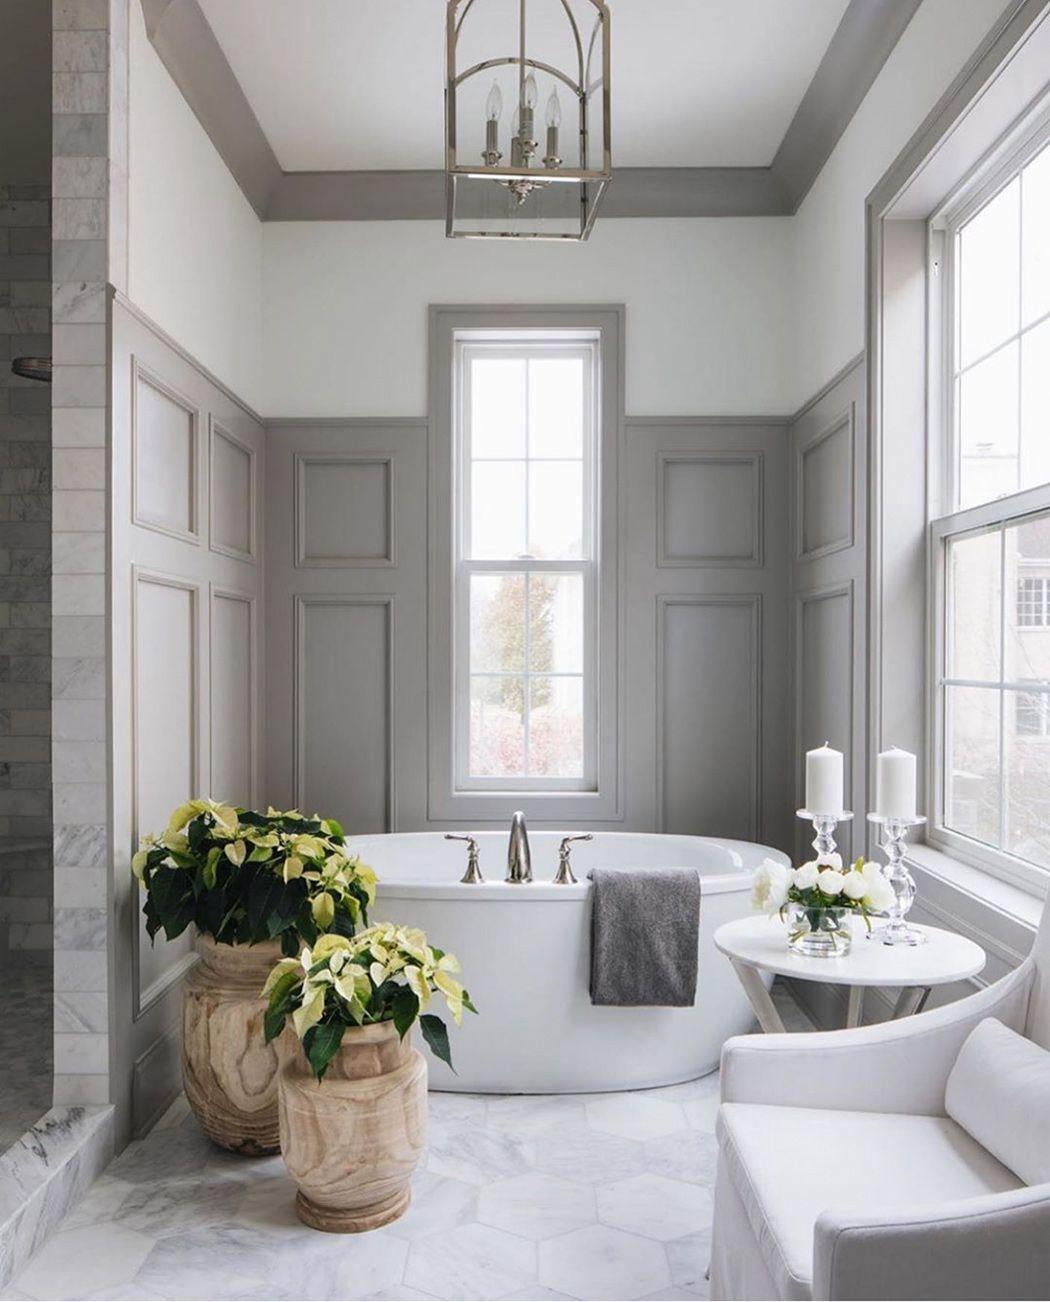 Bathroom Designs That You Can Escape To Part 3 Yanko Design In 2021 Traditional Bathroom Designs Bathroom Interior Bathroom Interior Design Traditional bathroom design ideas